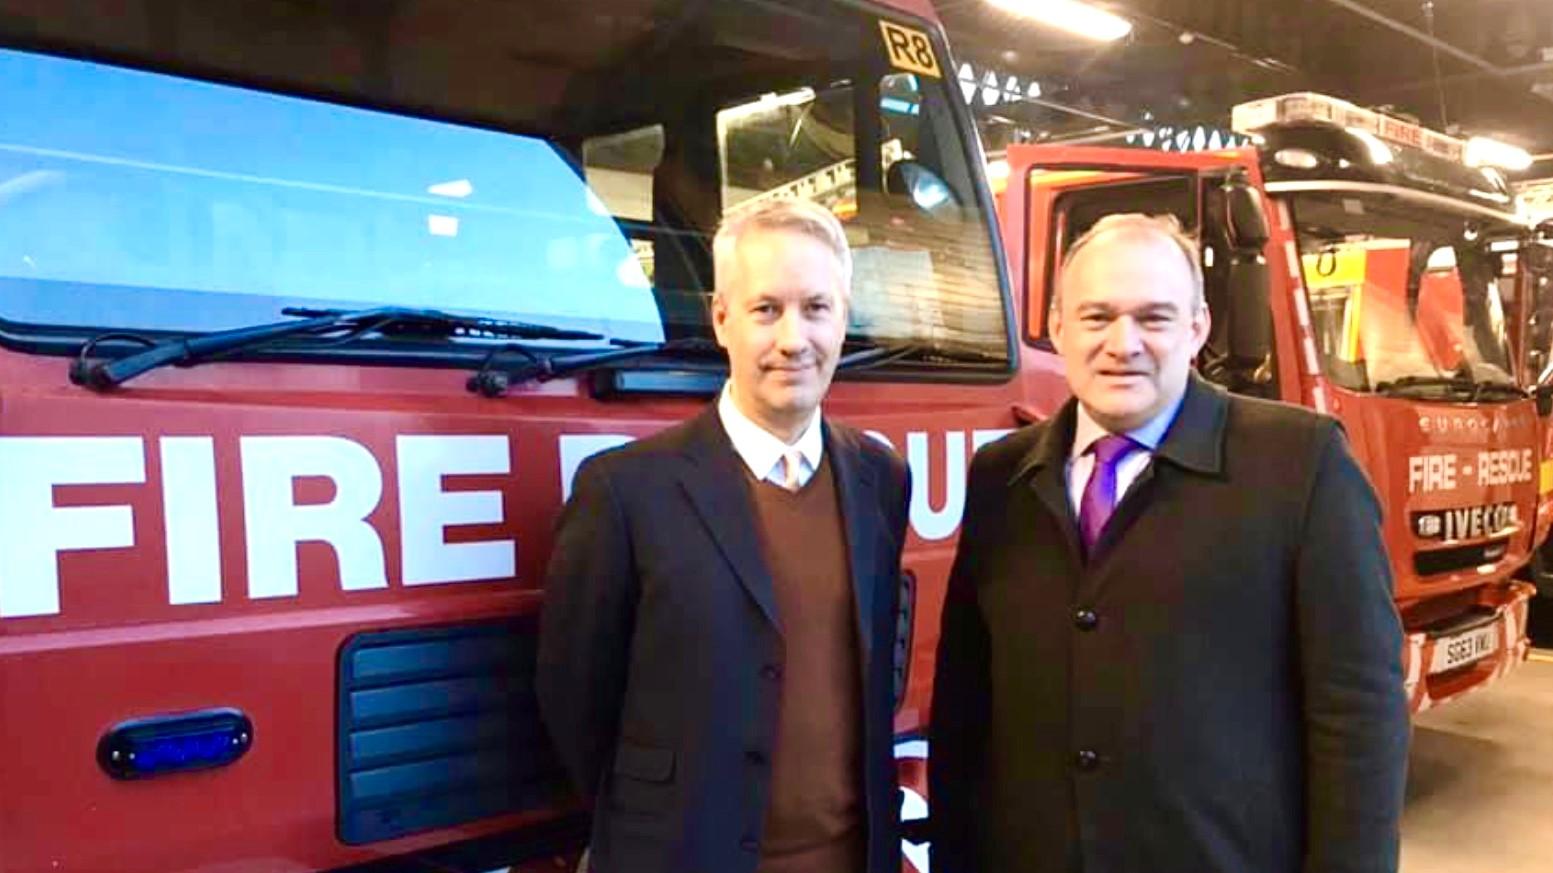 Gideon Amos Welcomes Sir Ed Davey as New Lib Dem Leader